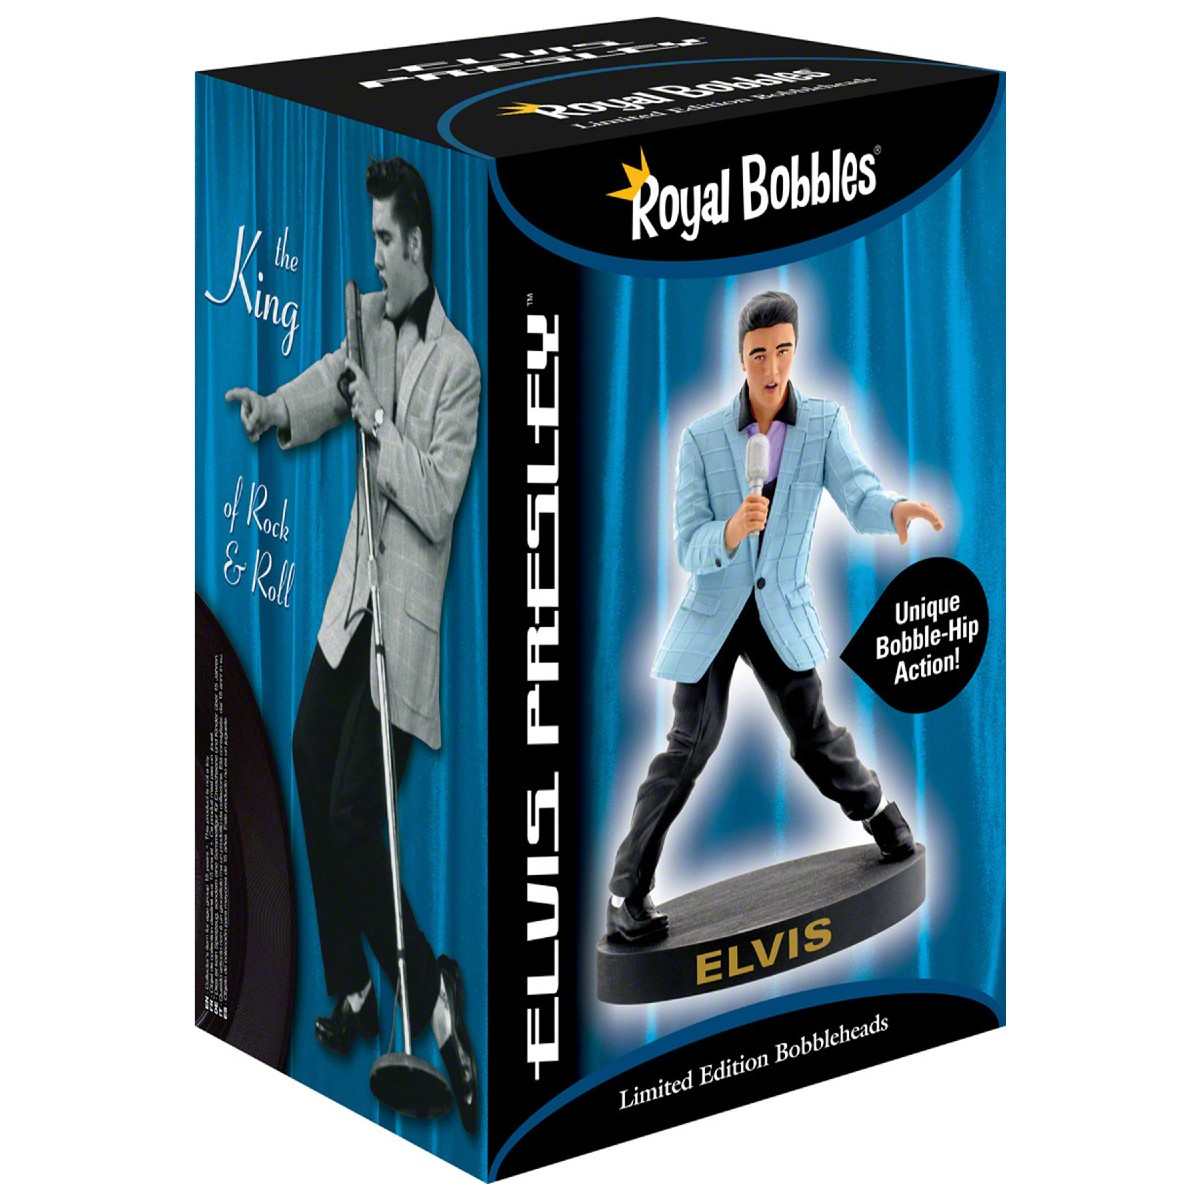 Elvis Blue Jacket Bobblehips Bobblehead